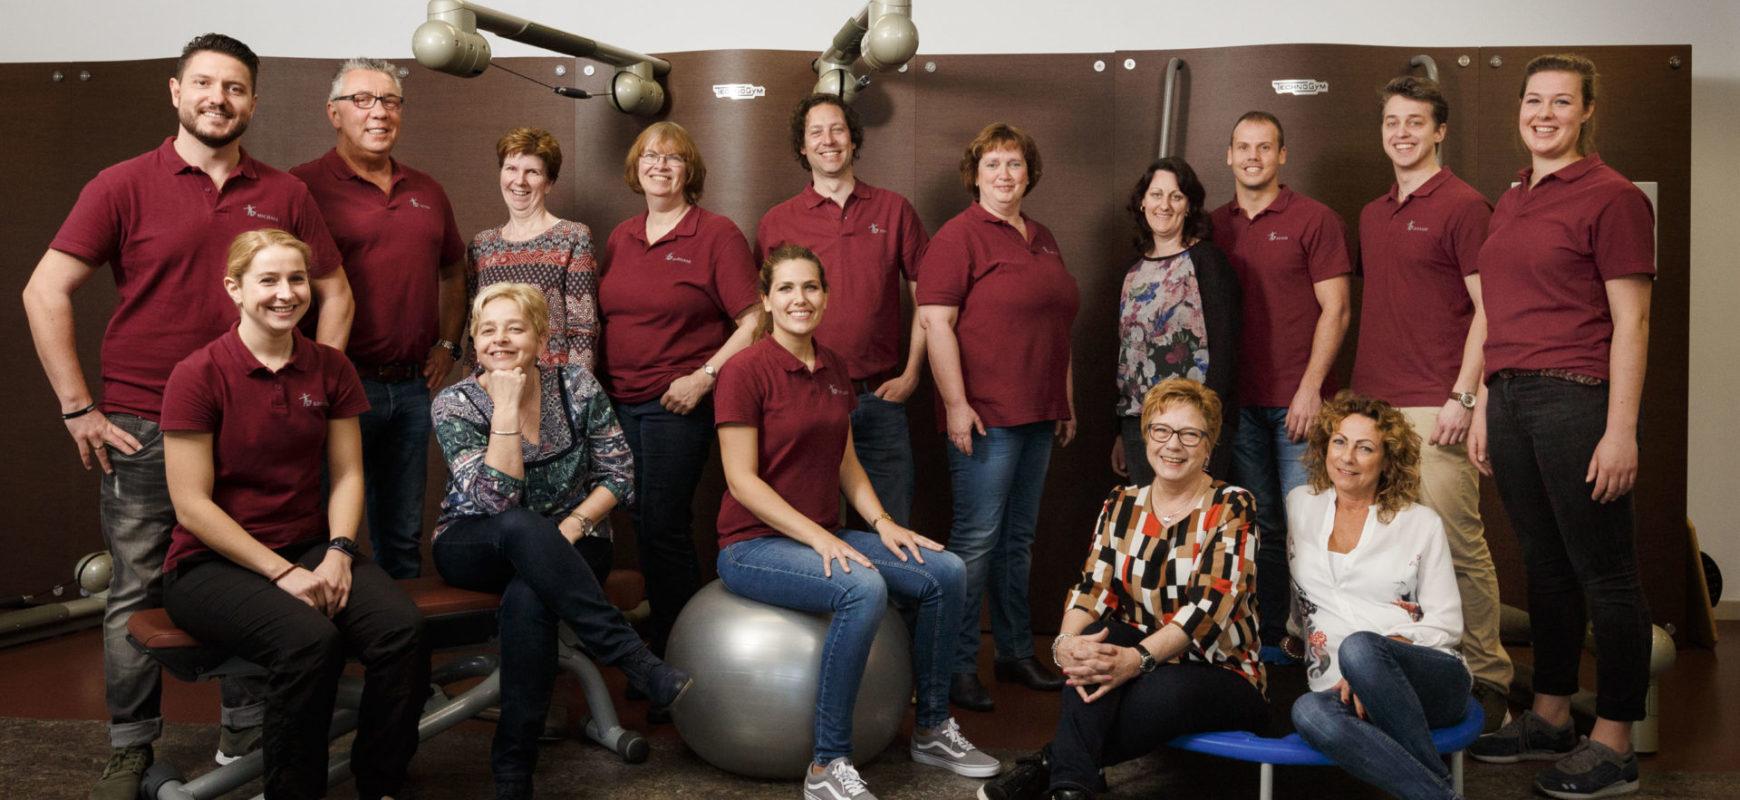 fysiotherapie, breda, breda west, paramedisch centrum, fysiotherapeut, manuele therapie, fysiotherapiepraktijk, behandelingen